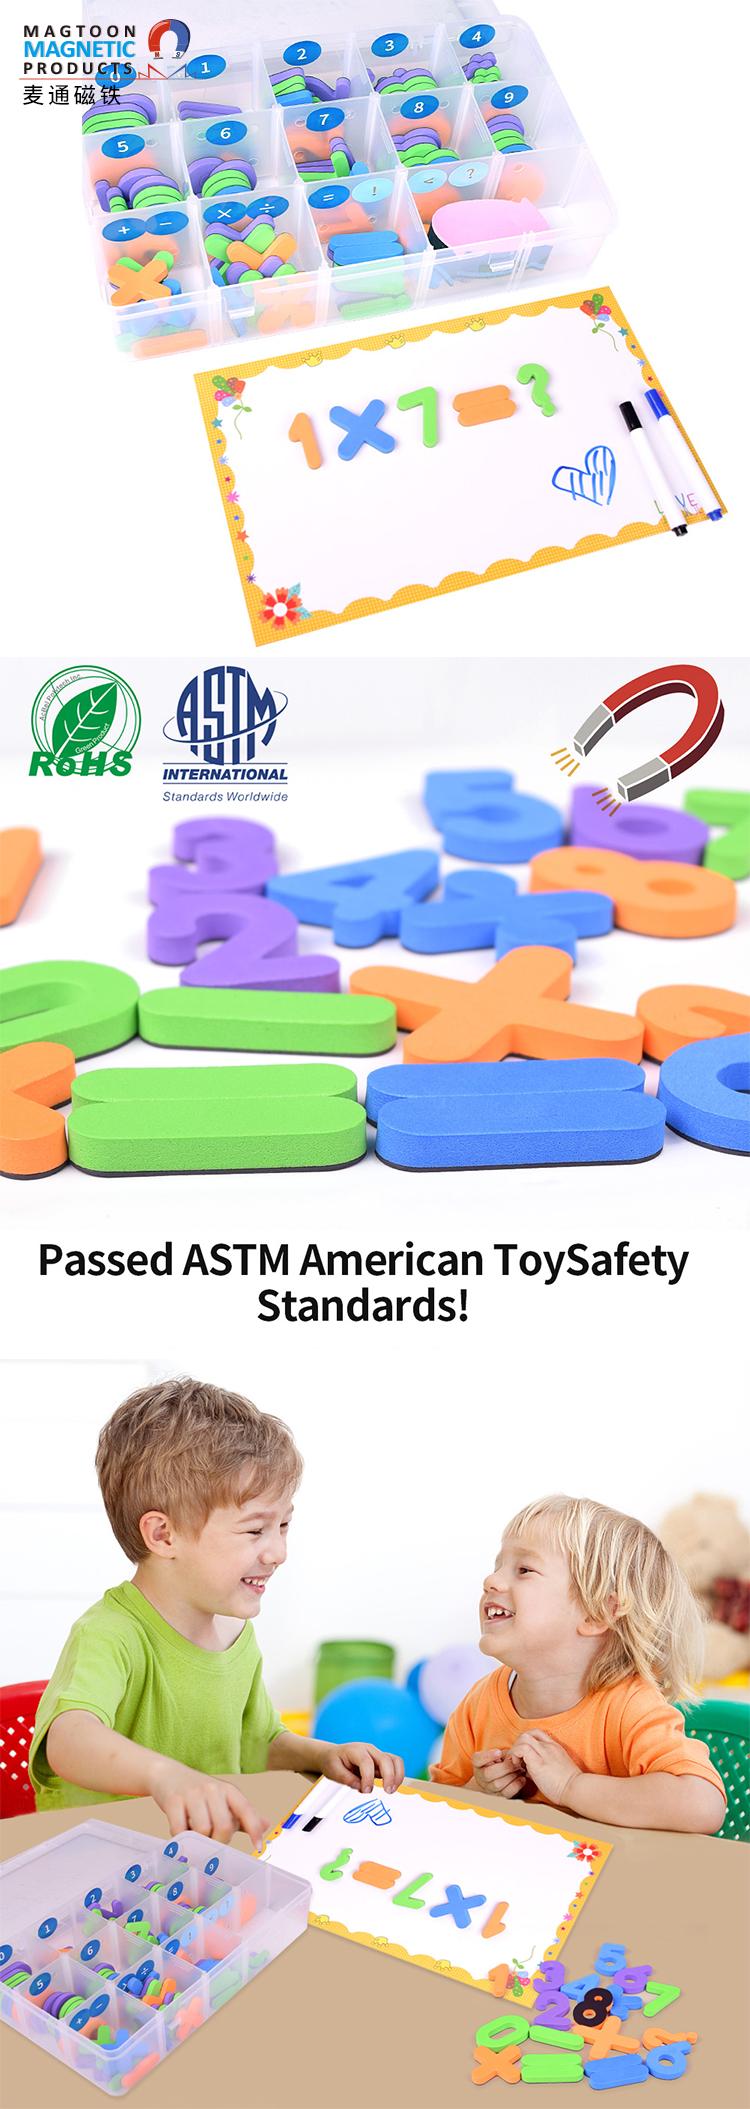 Custom EVA Foam Magnetic Letters and Number soft magnetic refrigerator sticker kids toys